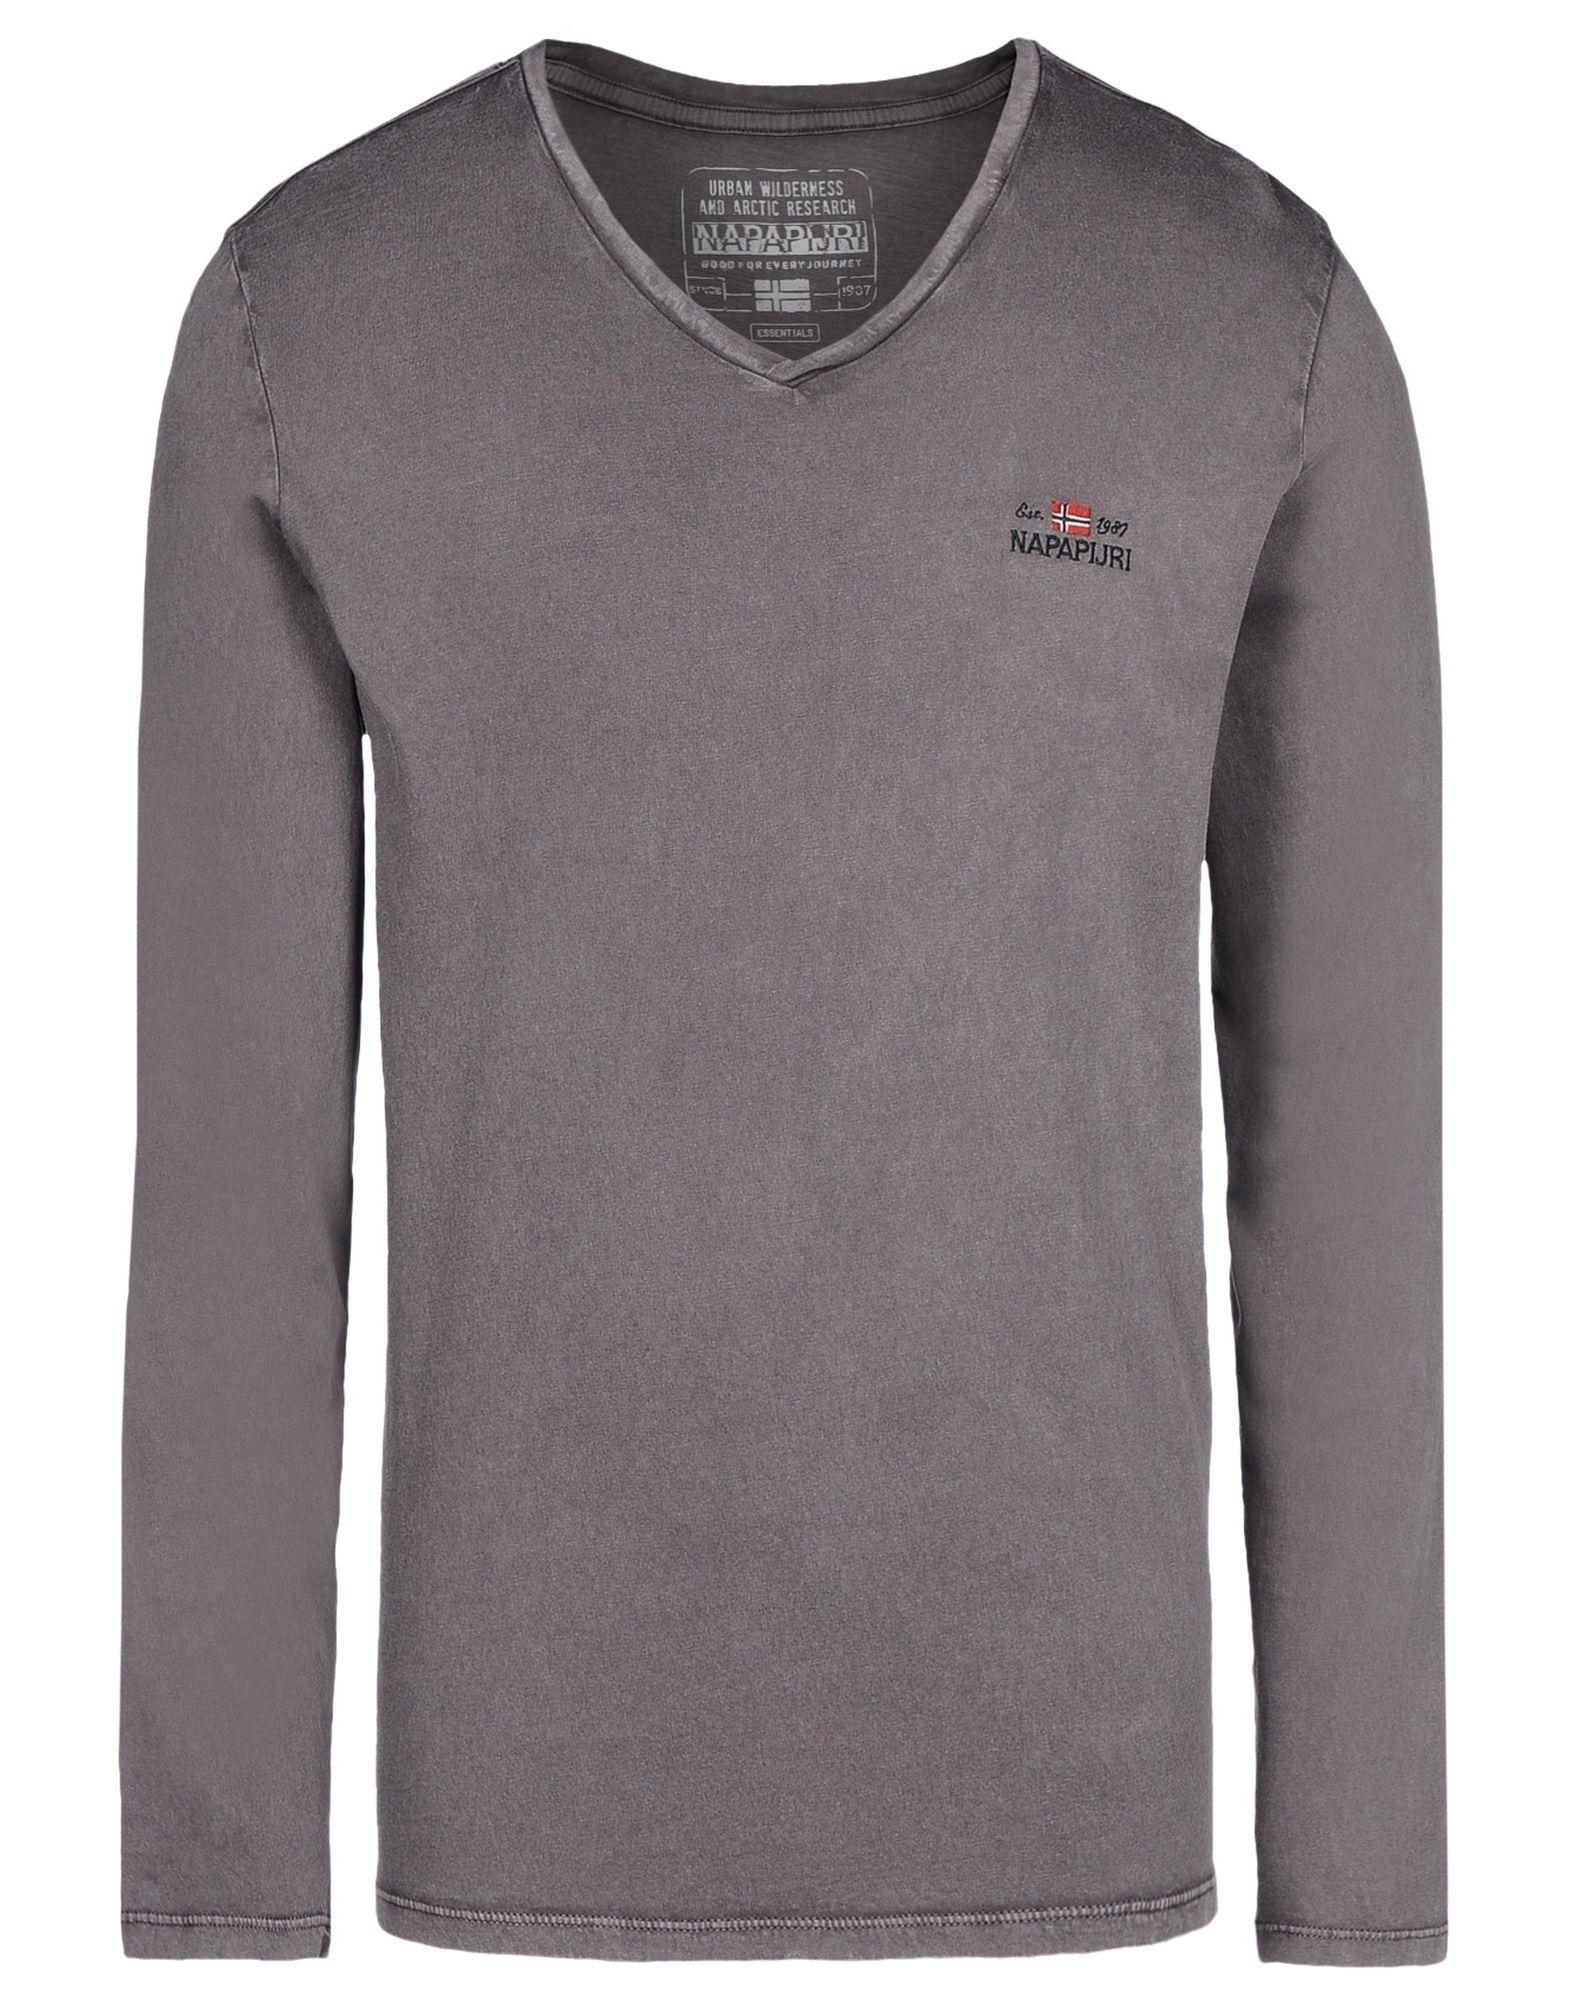 napapijri t shirt in grey for men lyst. Black Bedroom Furniture Sets. Home Design Ideas